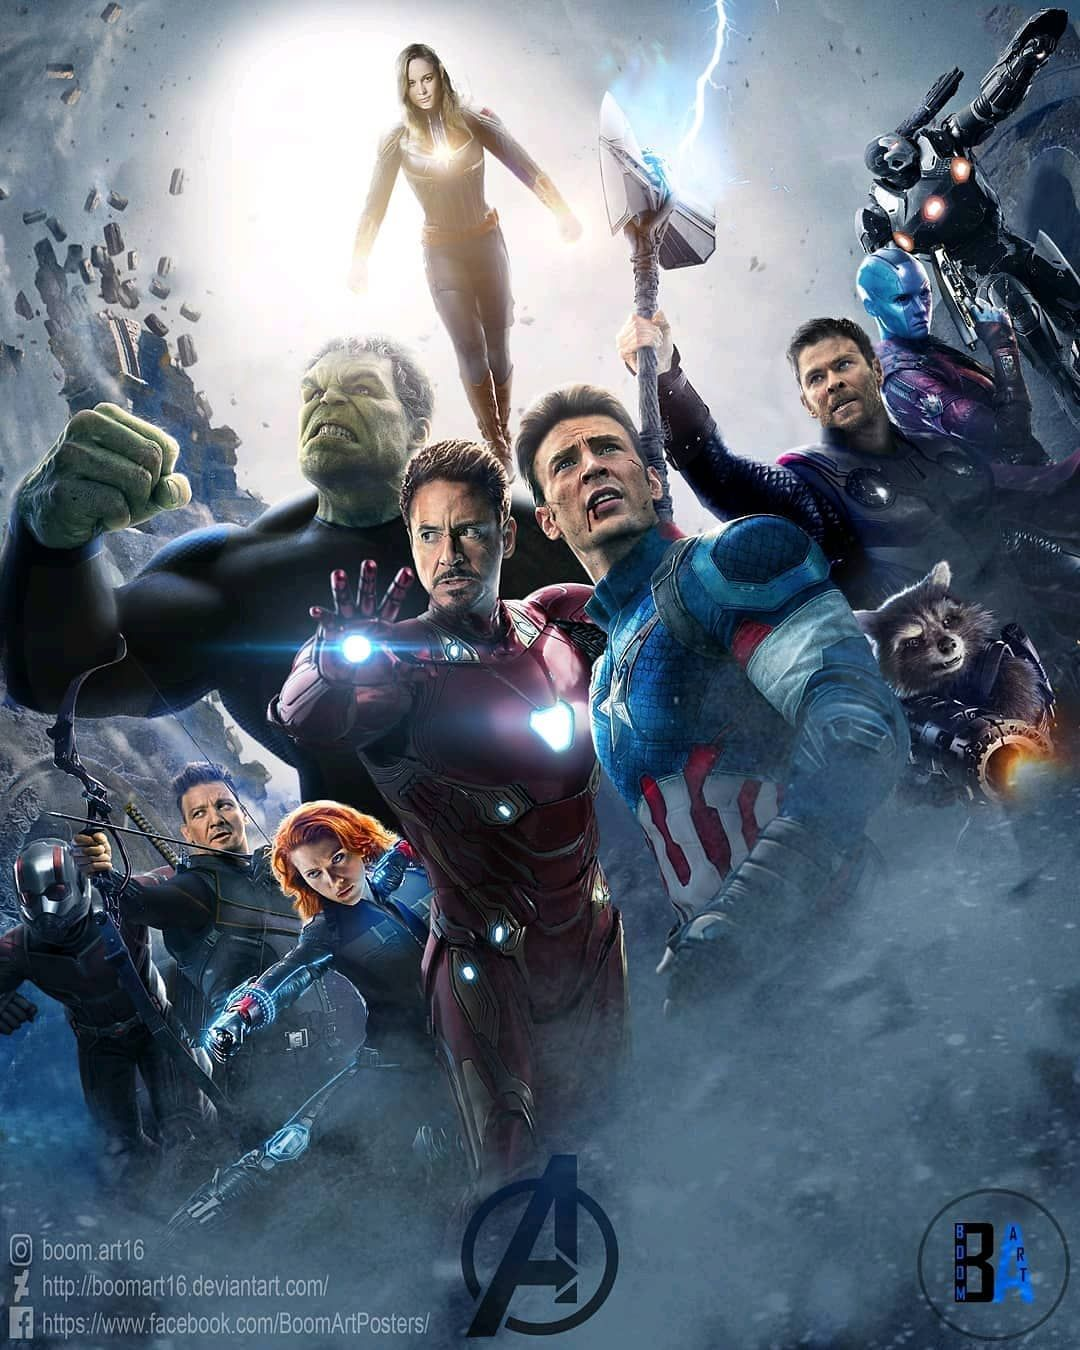 Avengers 4 Art By Boom Art16 Fanmade